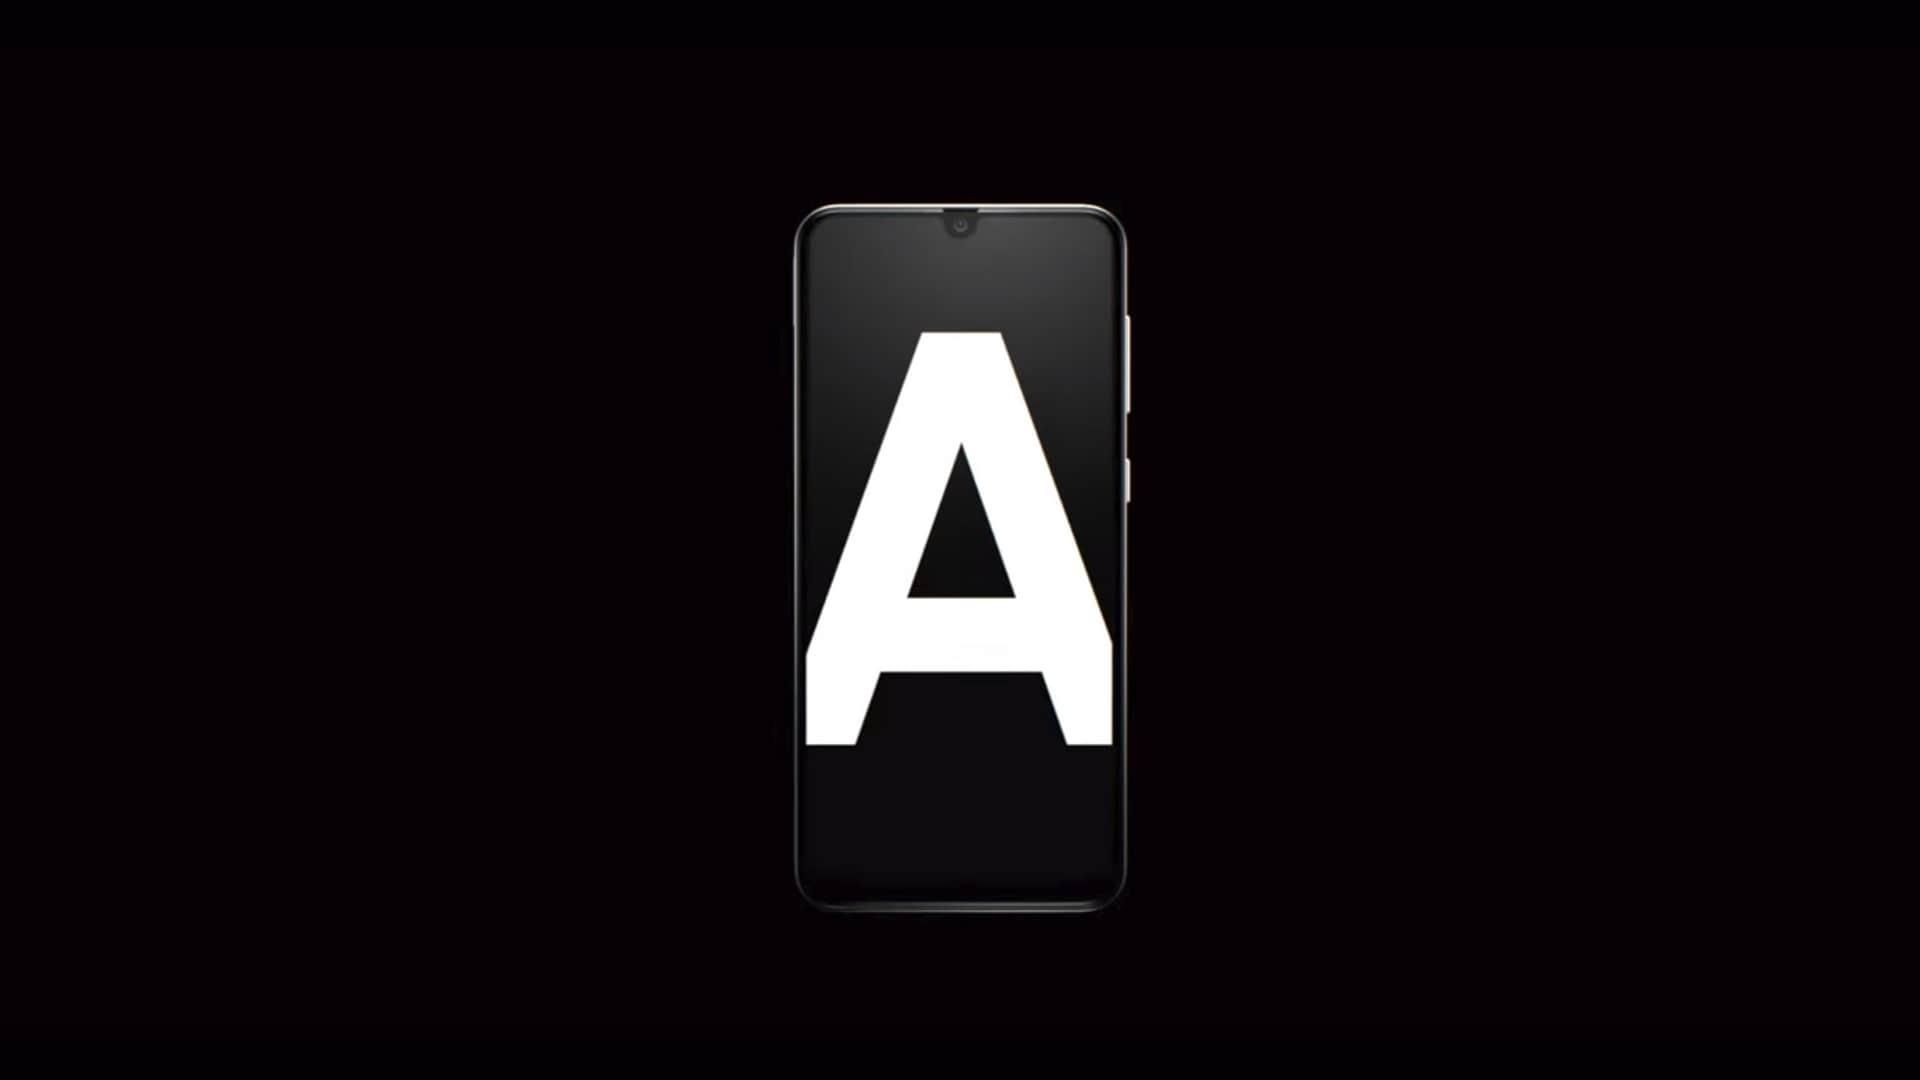 Black Wallpaper Samsung A10